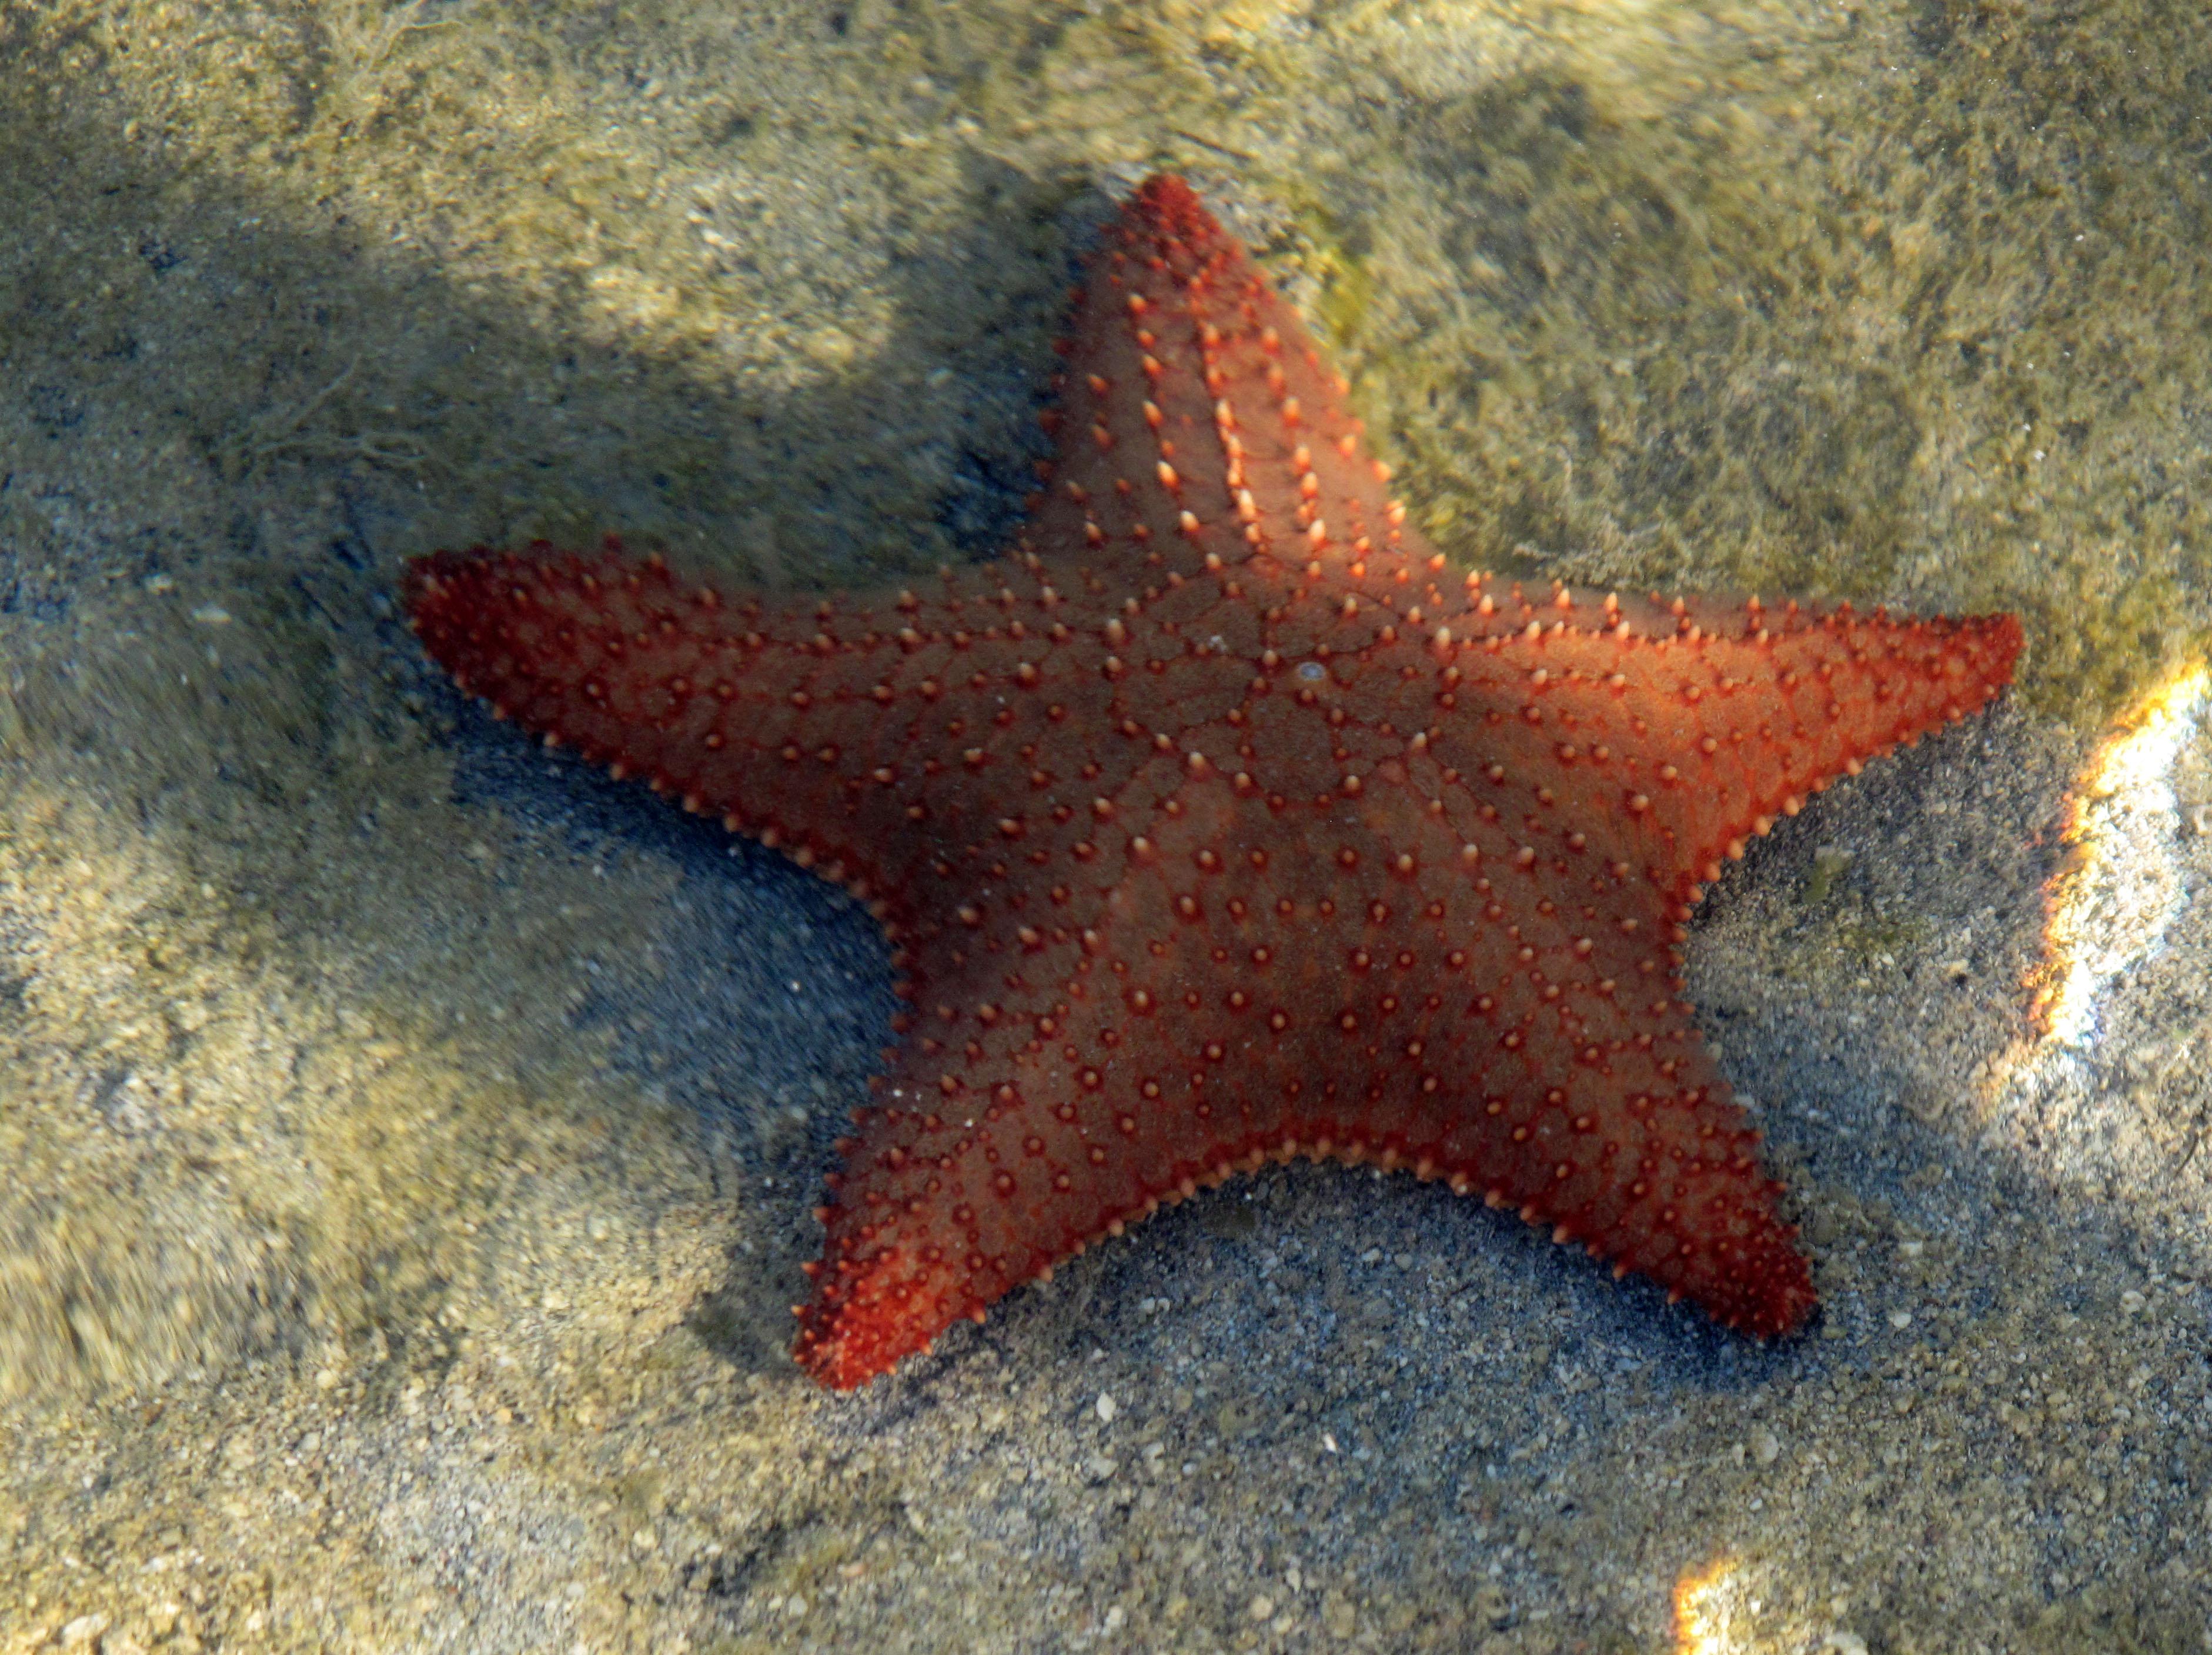 Starfish at Green Turtle Cay, Abaco, Bahamas.